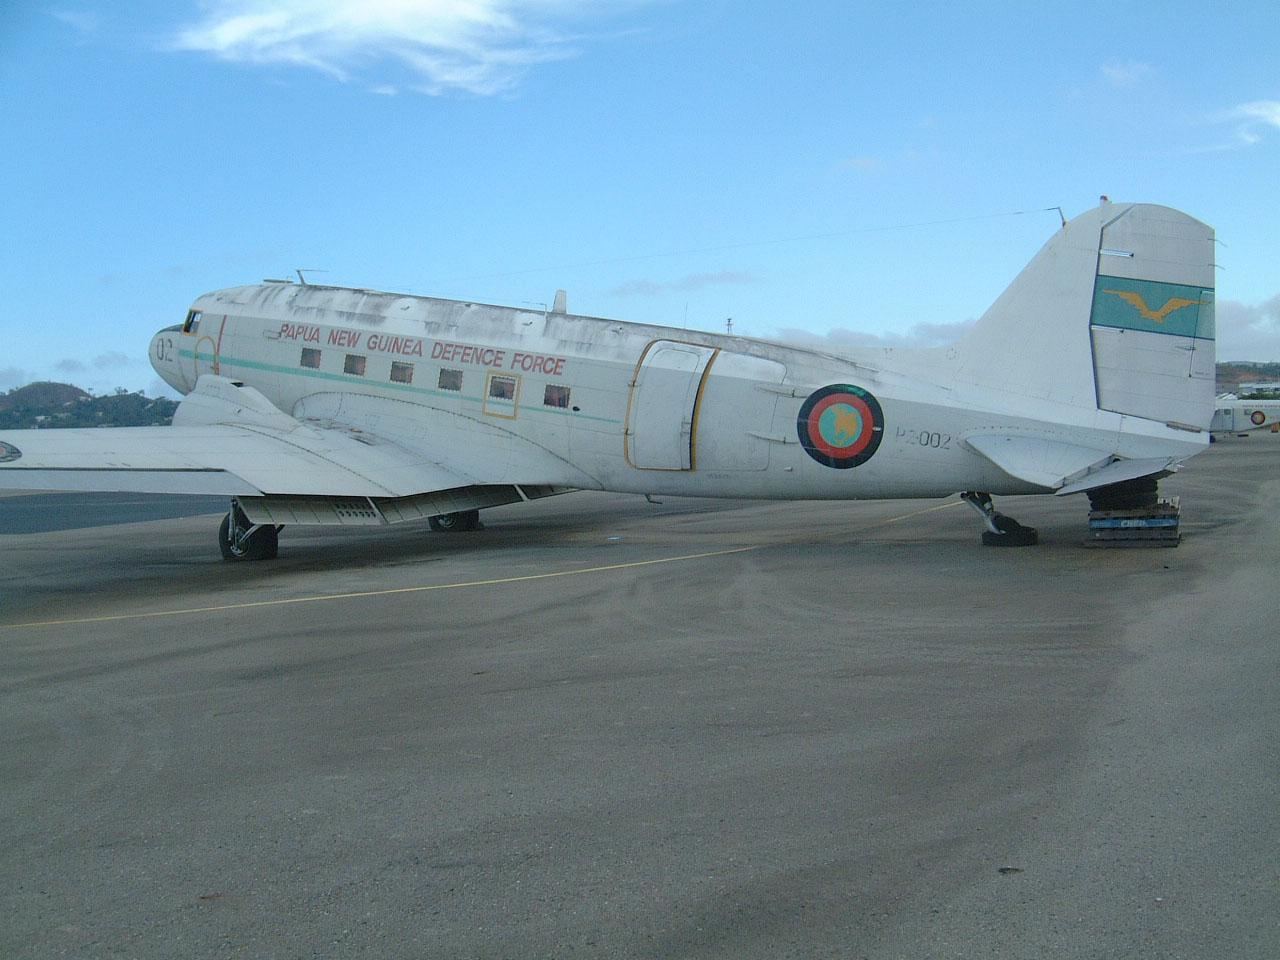 PNGDF C 47 P2 002 ex USAAF 44 76545 Derelict Jacksons Airport Sep 2002 01